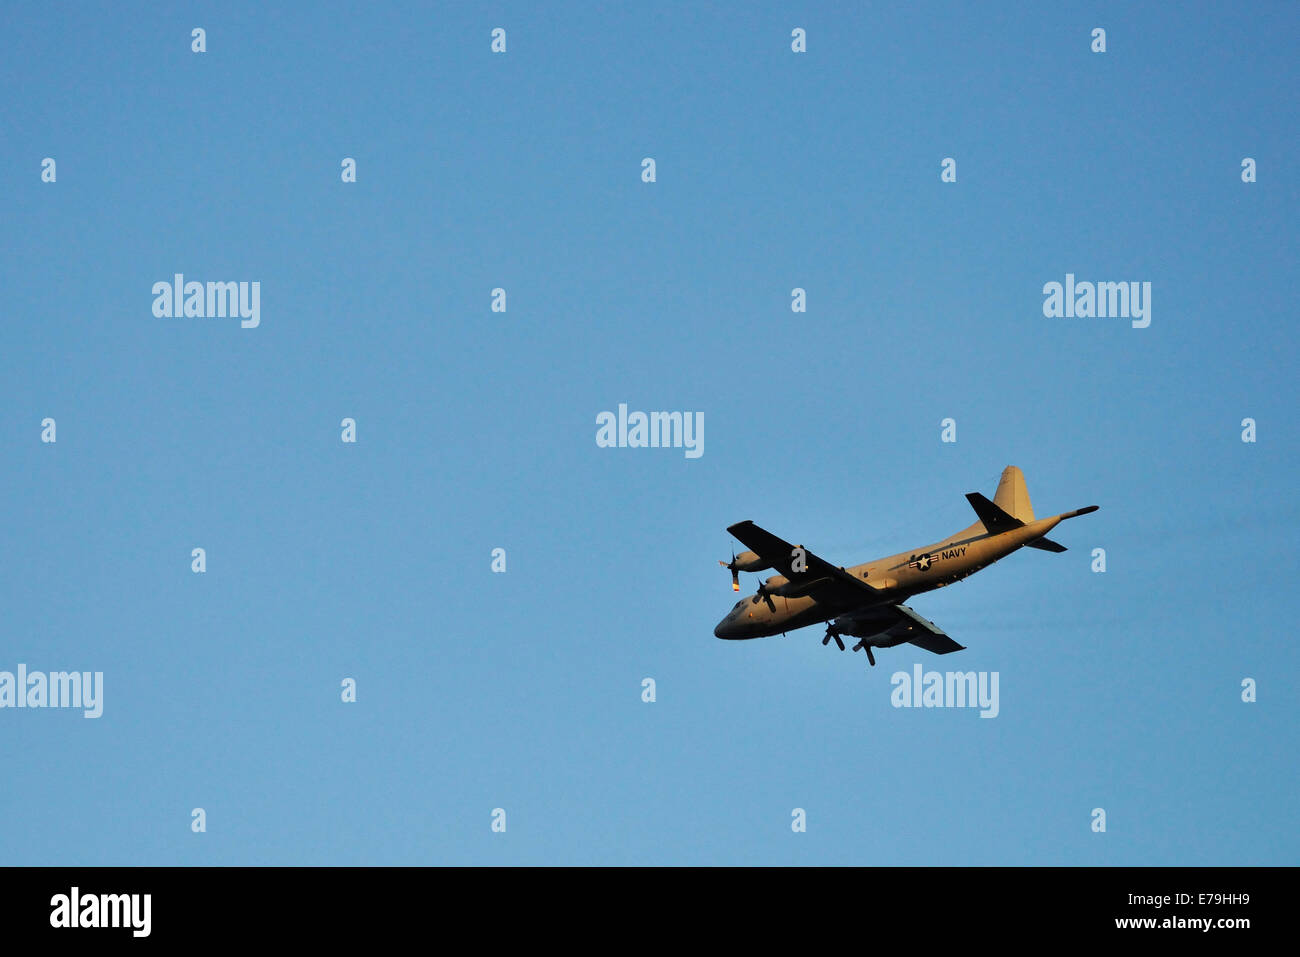 US Navy military airplane, Big Island, Hawaii Islands, USA - Stock Image